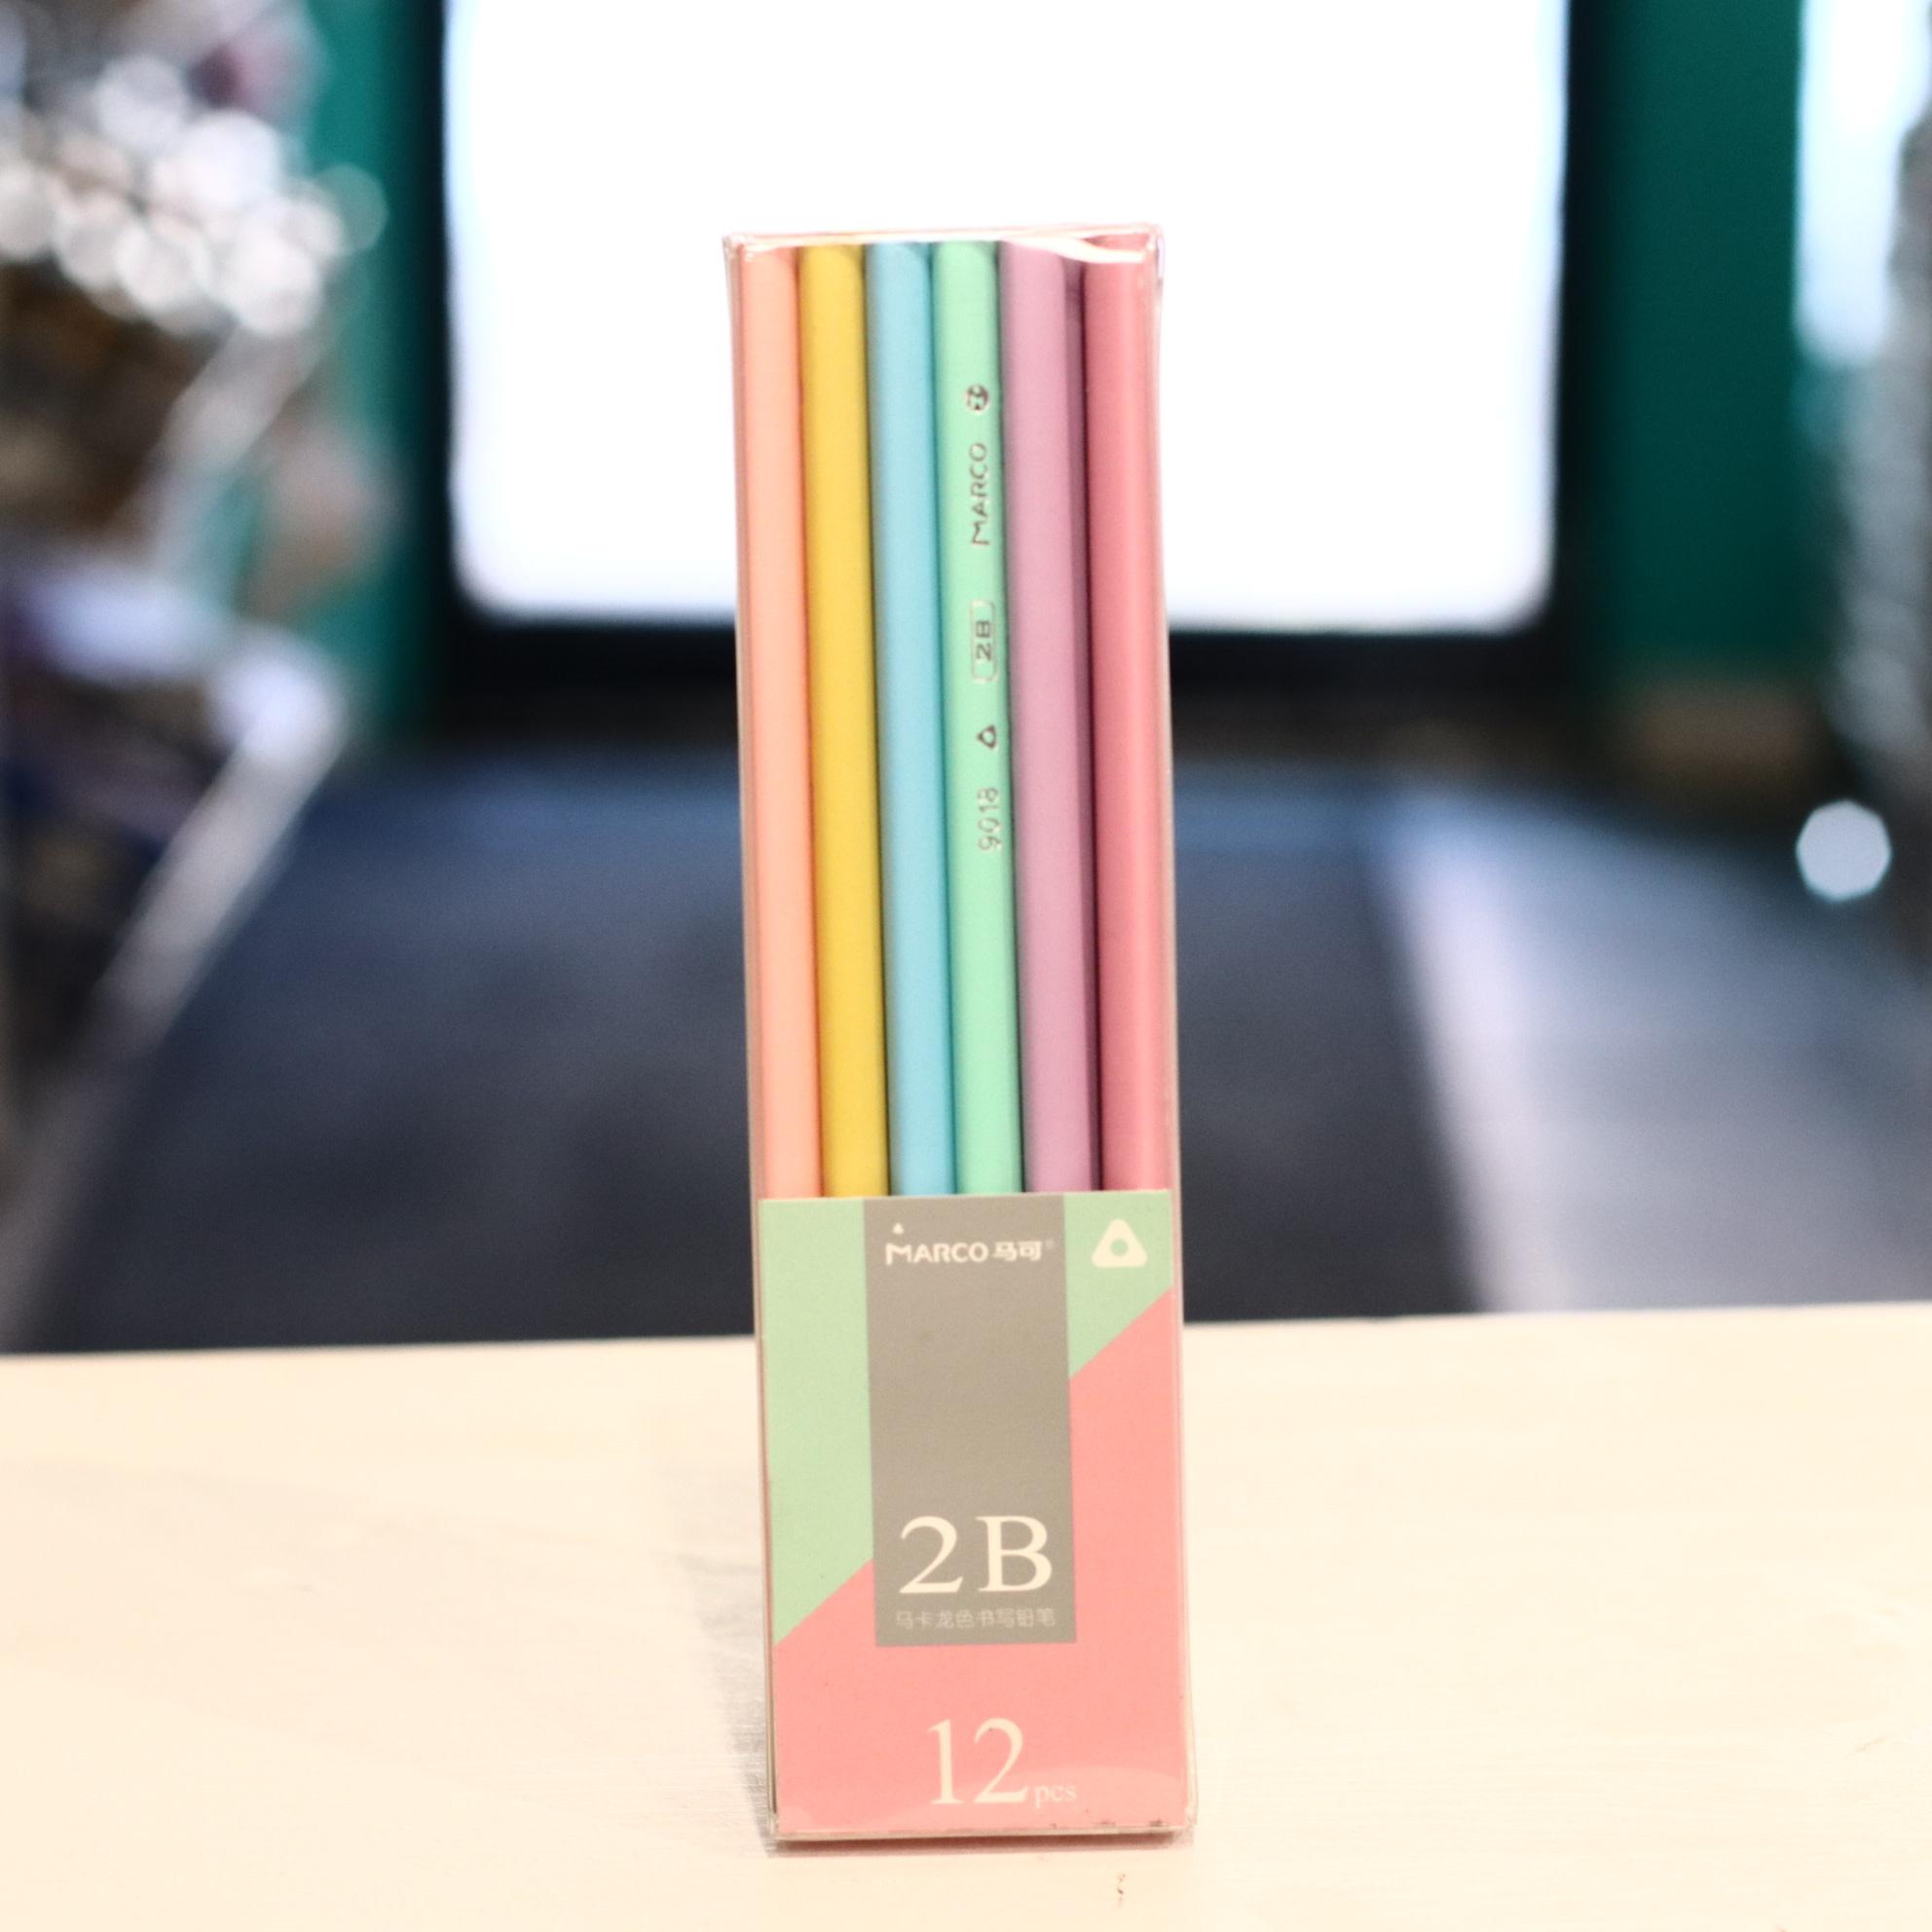 D9018-2B-12PB(T) 2B Macaron Pencils Box